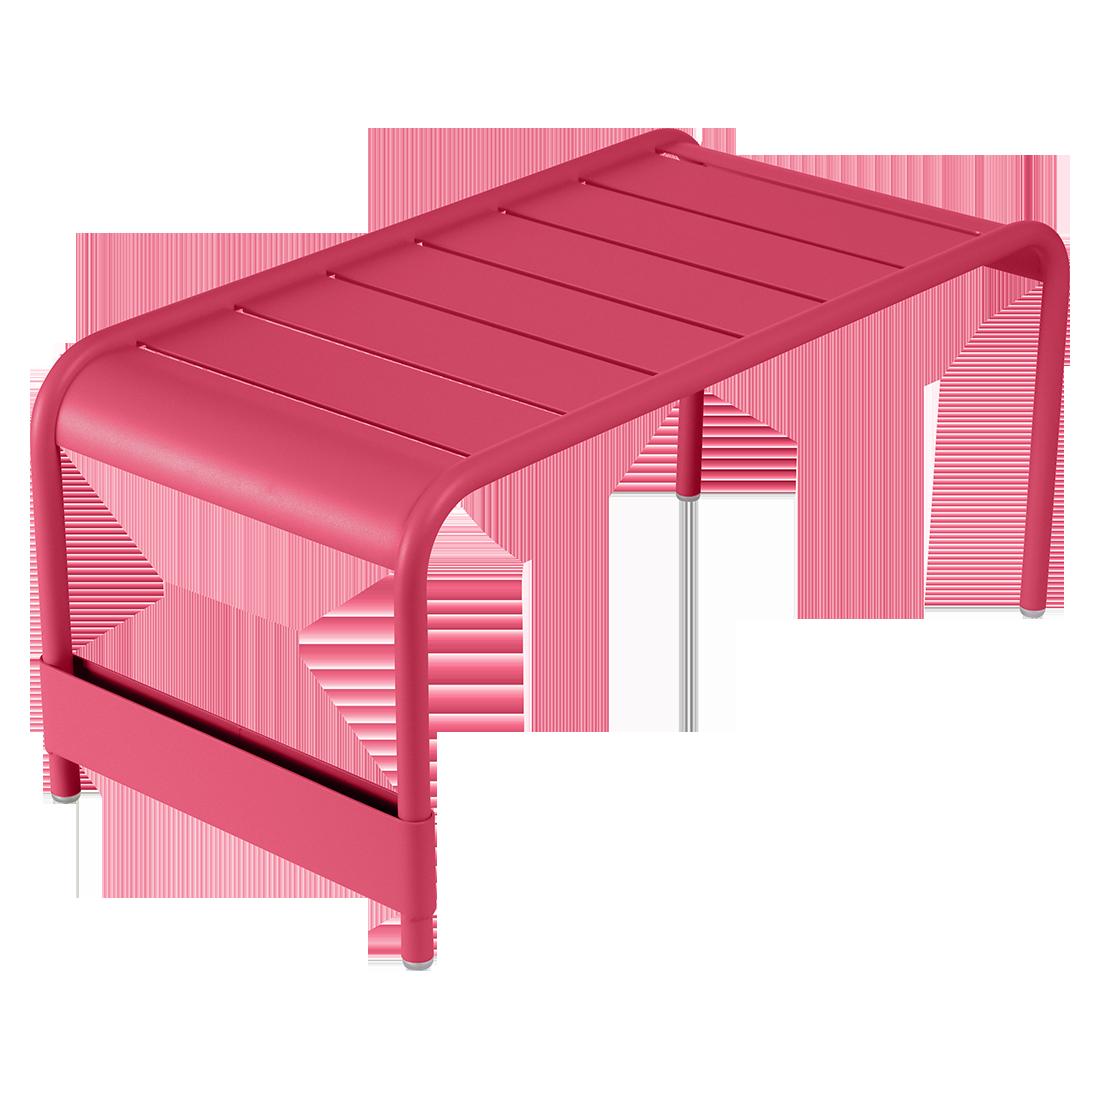 grande table basse luxembourg de fermob rose praline. Black Bedroom Furniture Sets. Home Design Ideas